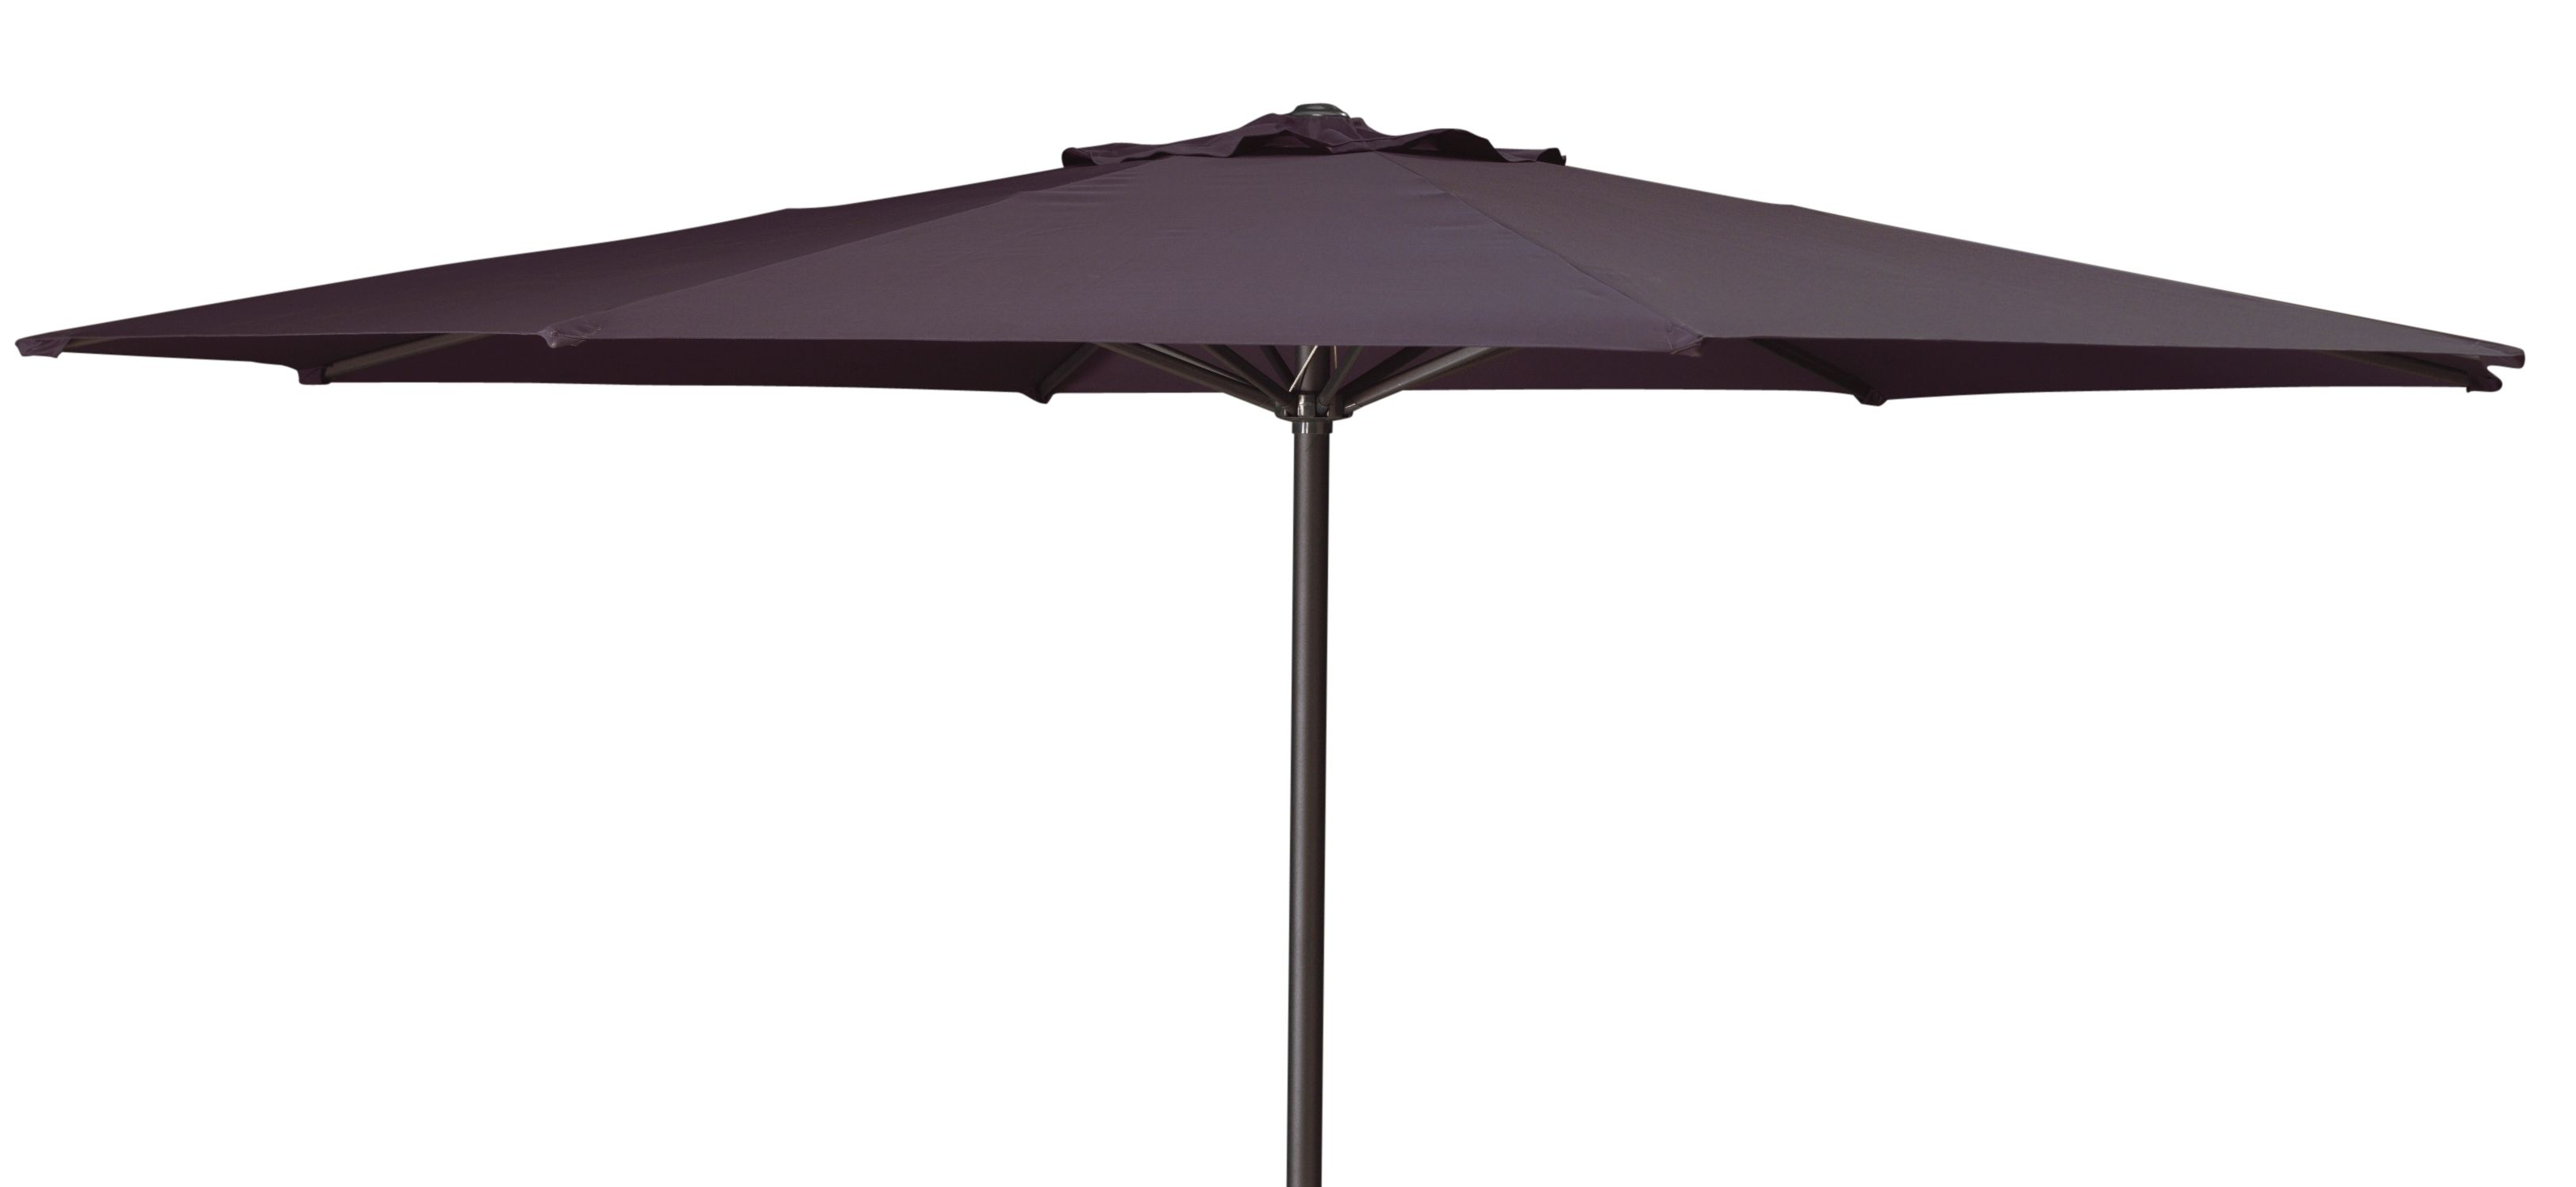 Parasol Sandino Rond Taupe ?3 Meter